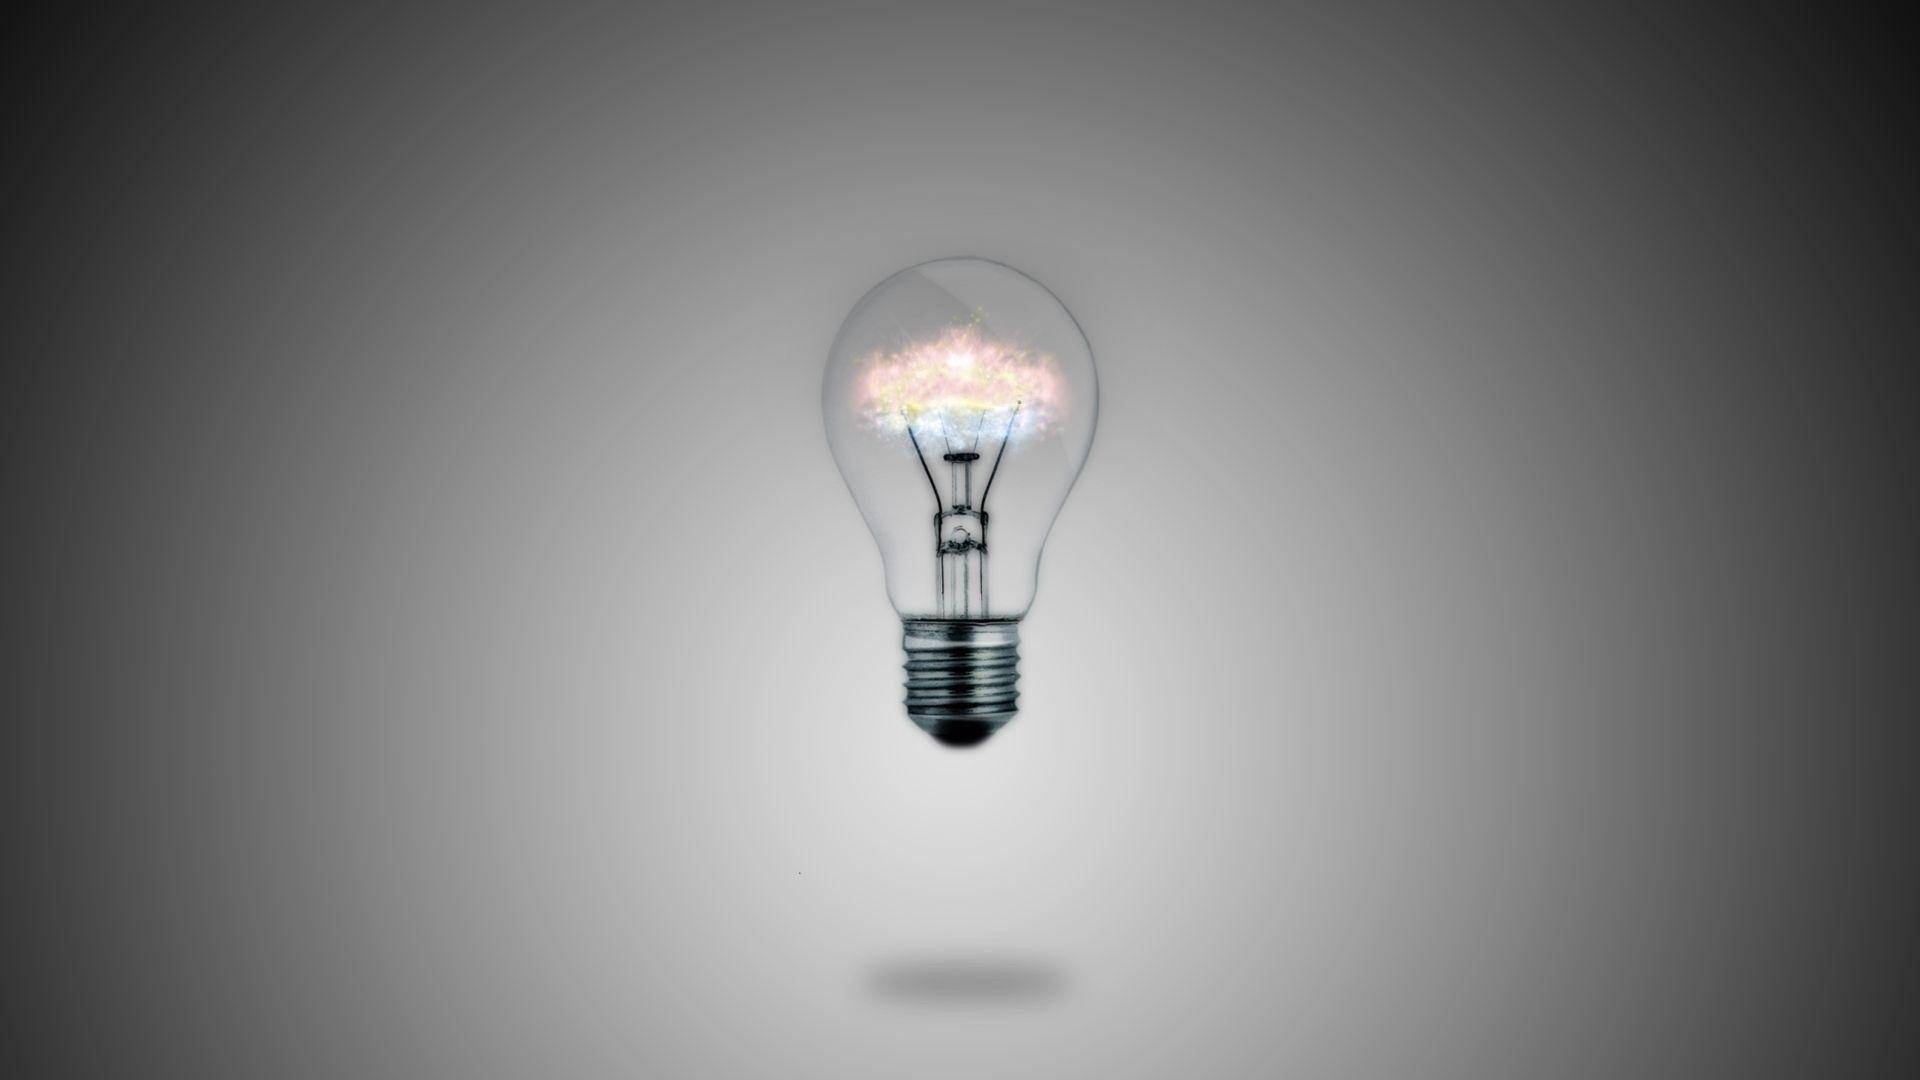 light bulb | light bulbs | pinterest | light bulb, bulbs and wallpaper